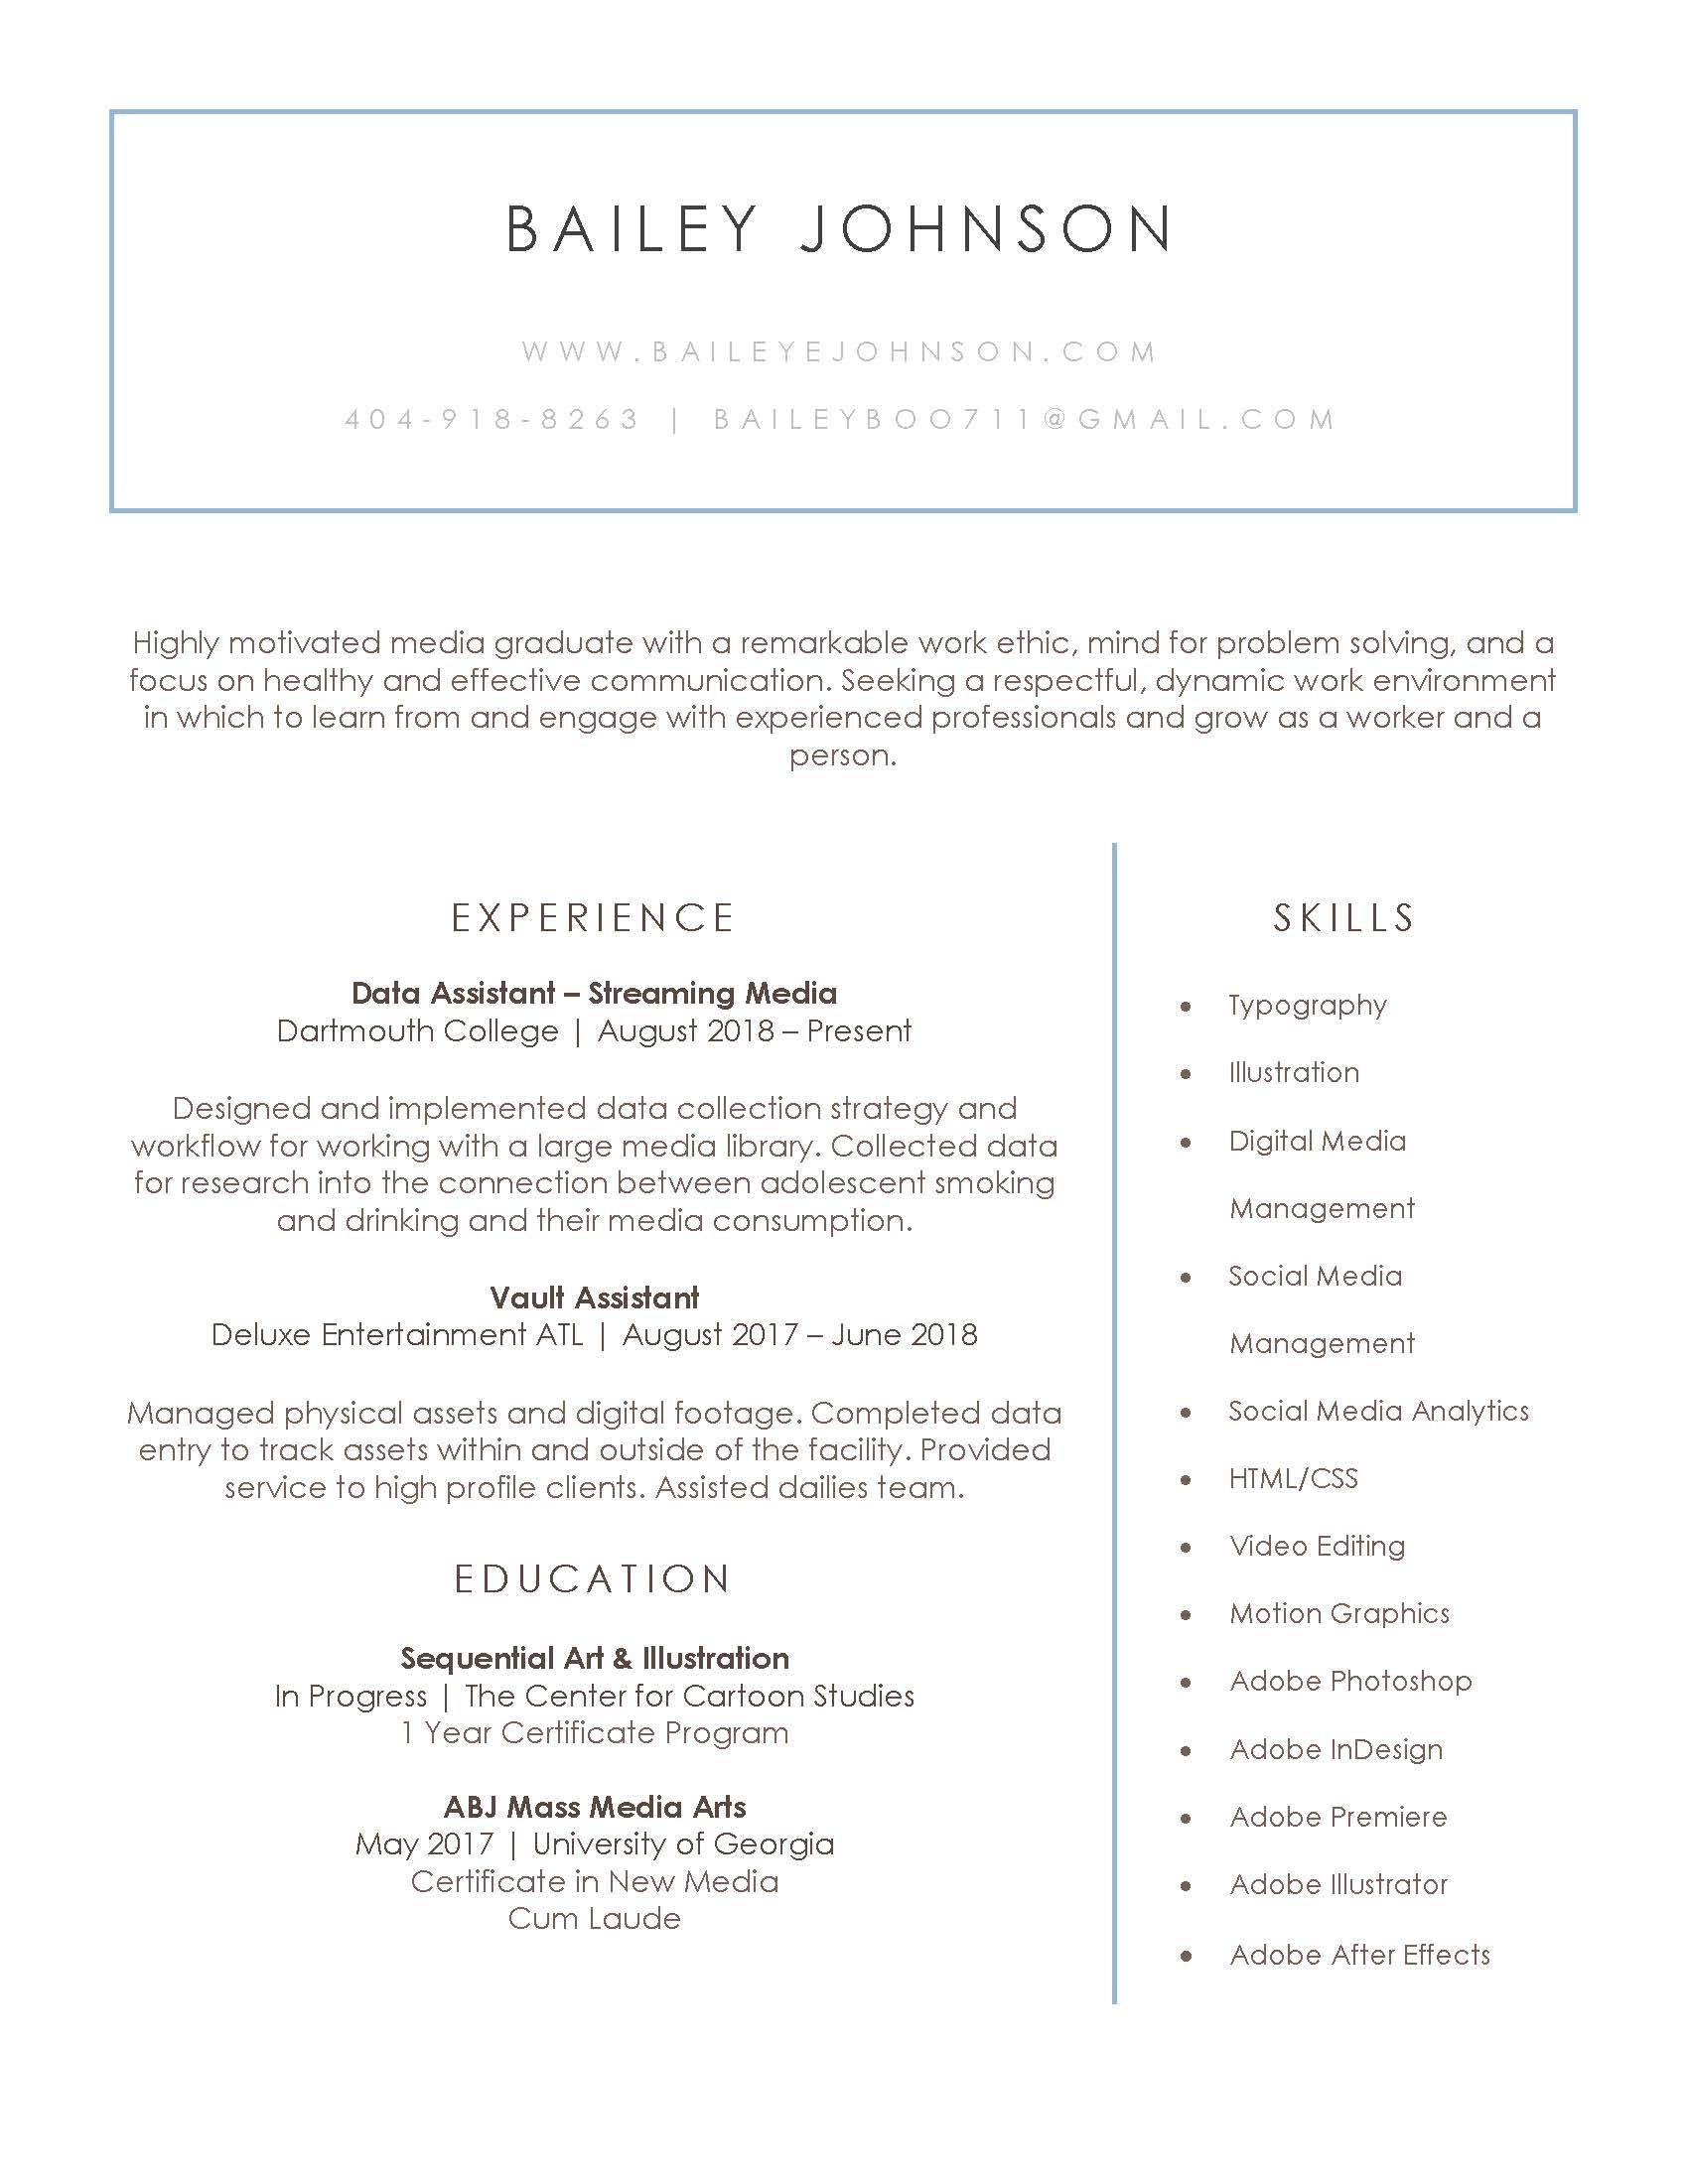 bjohnson_resume.jpg